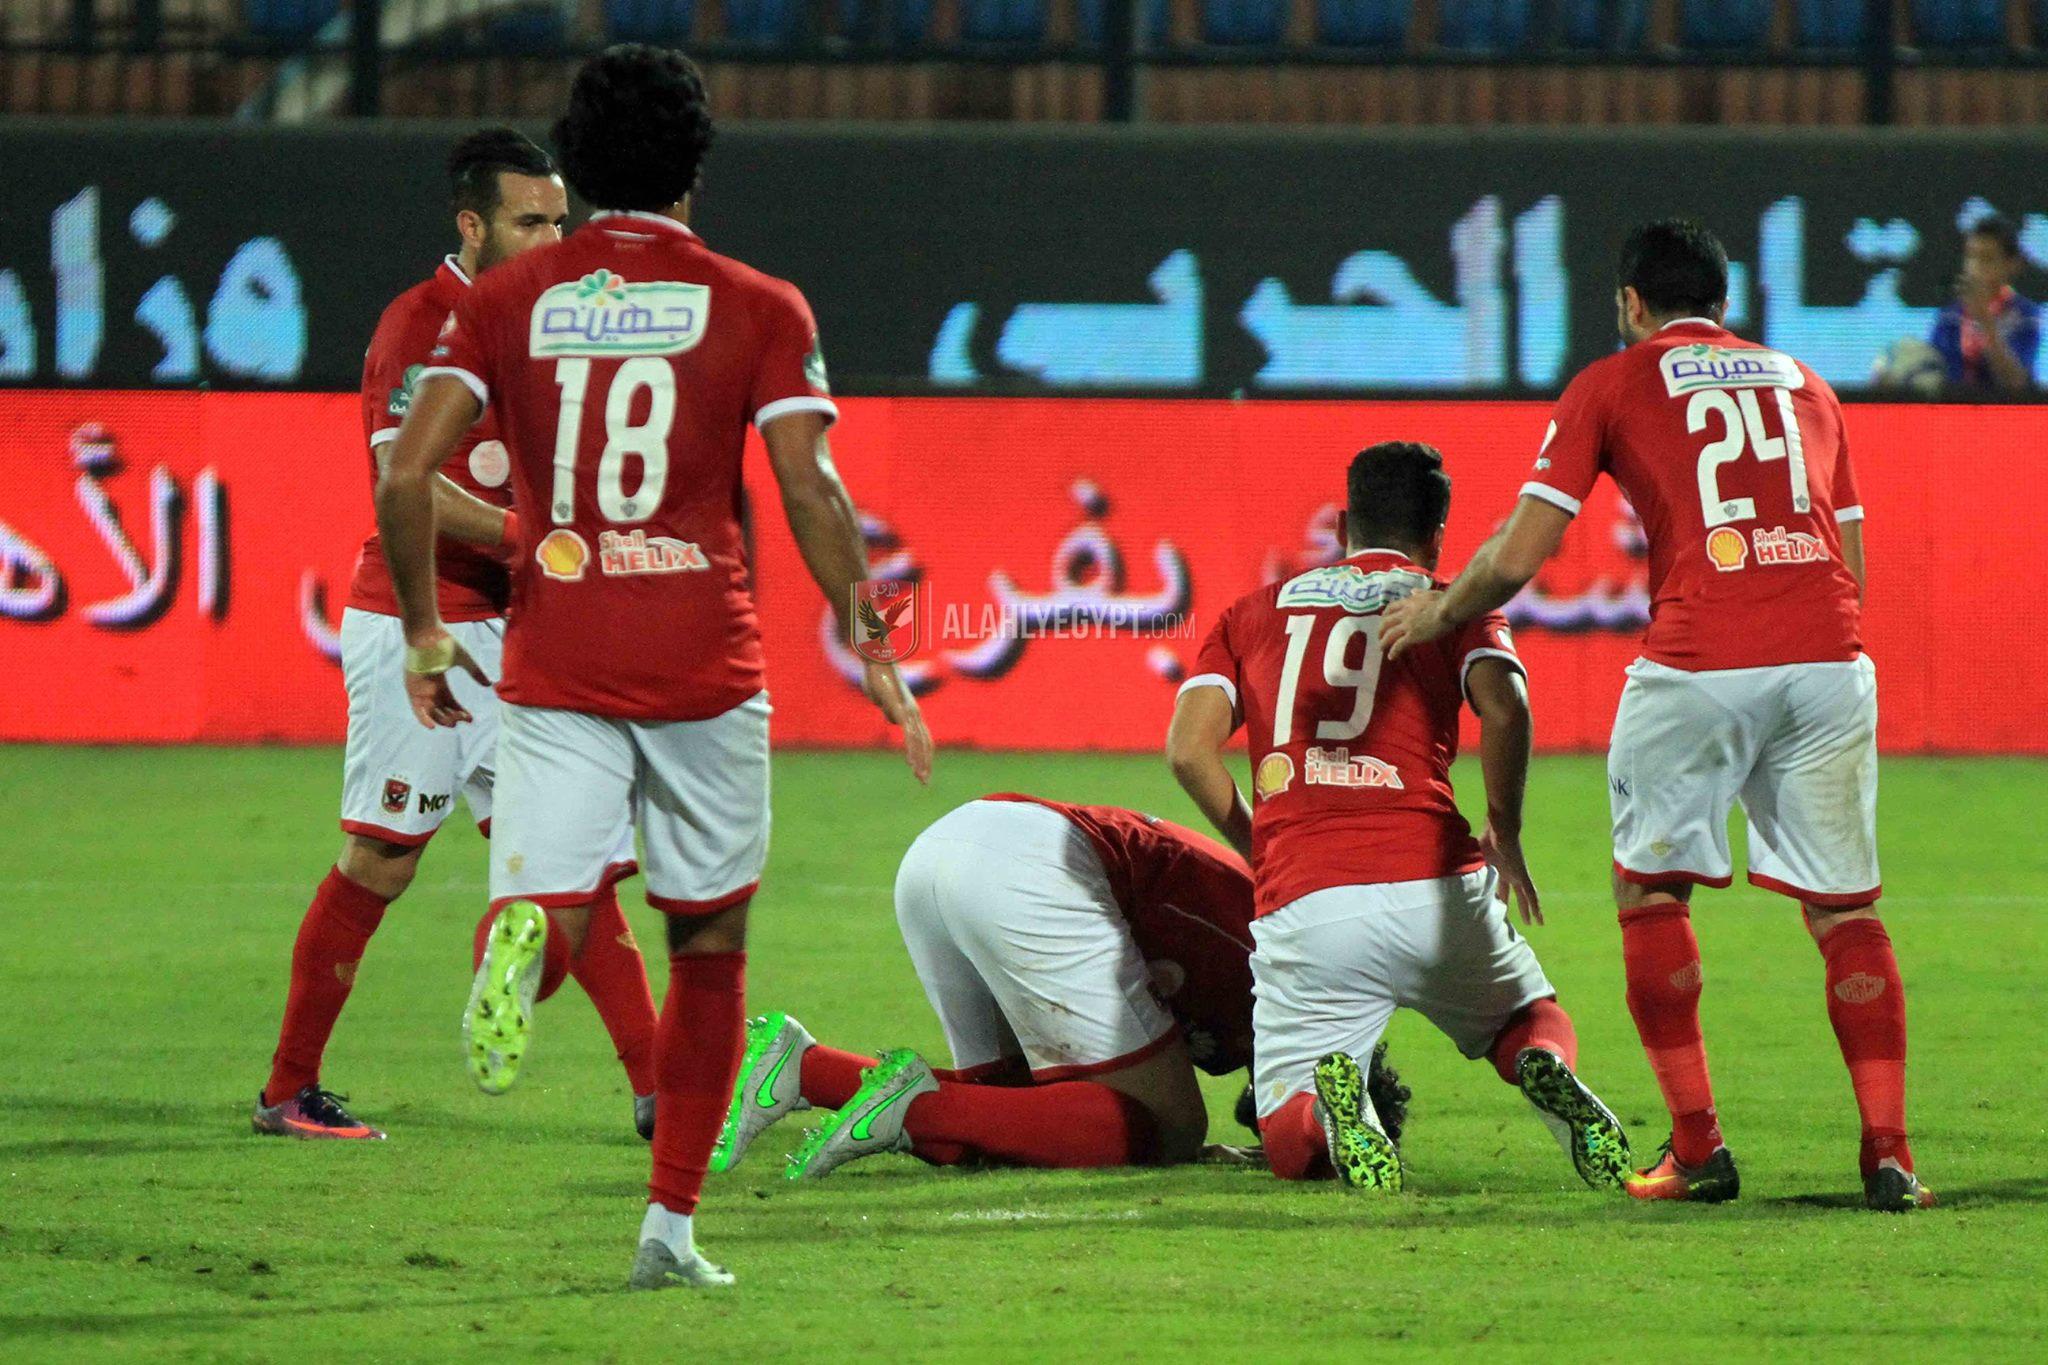 Al Ahly Misr El-Maqassa